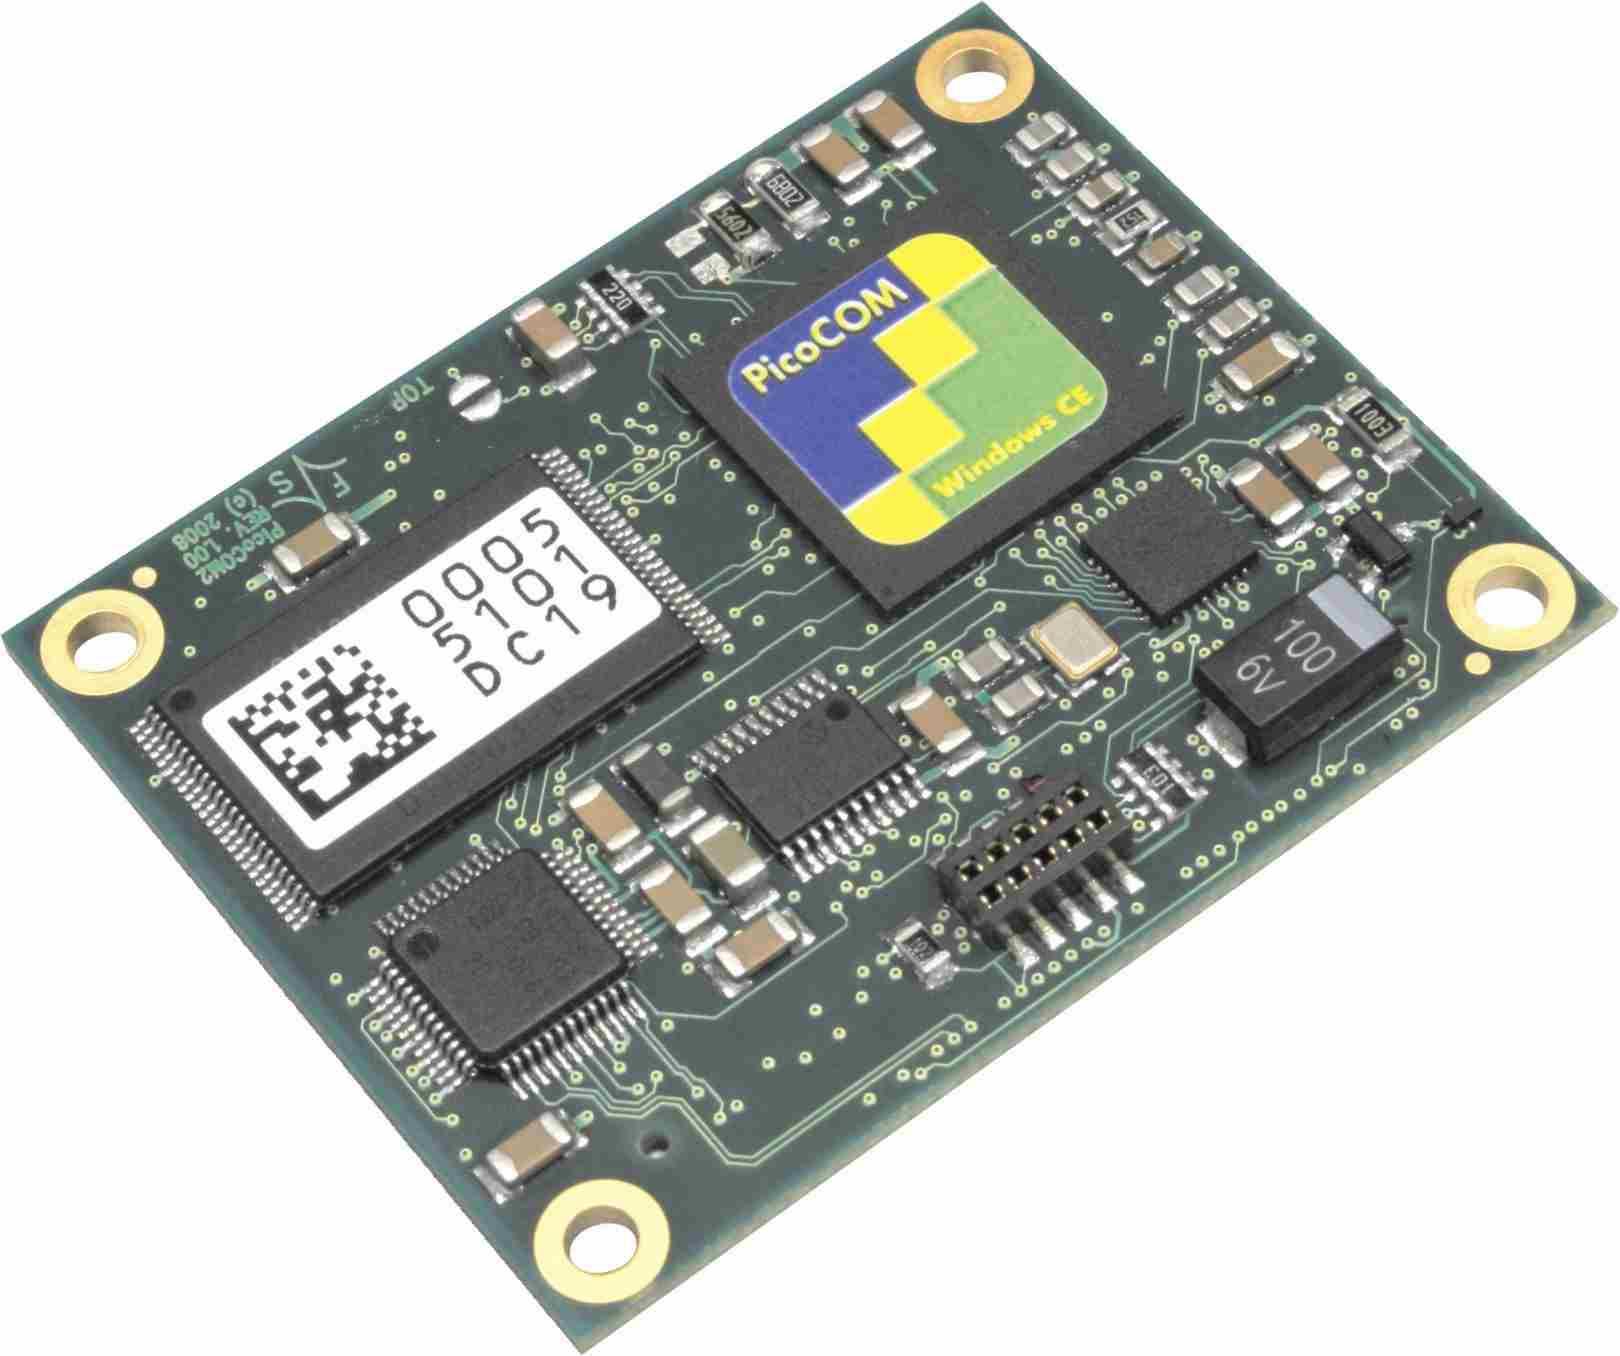 electronica: Rutronik presents new Single Board Computer